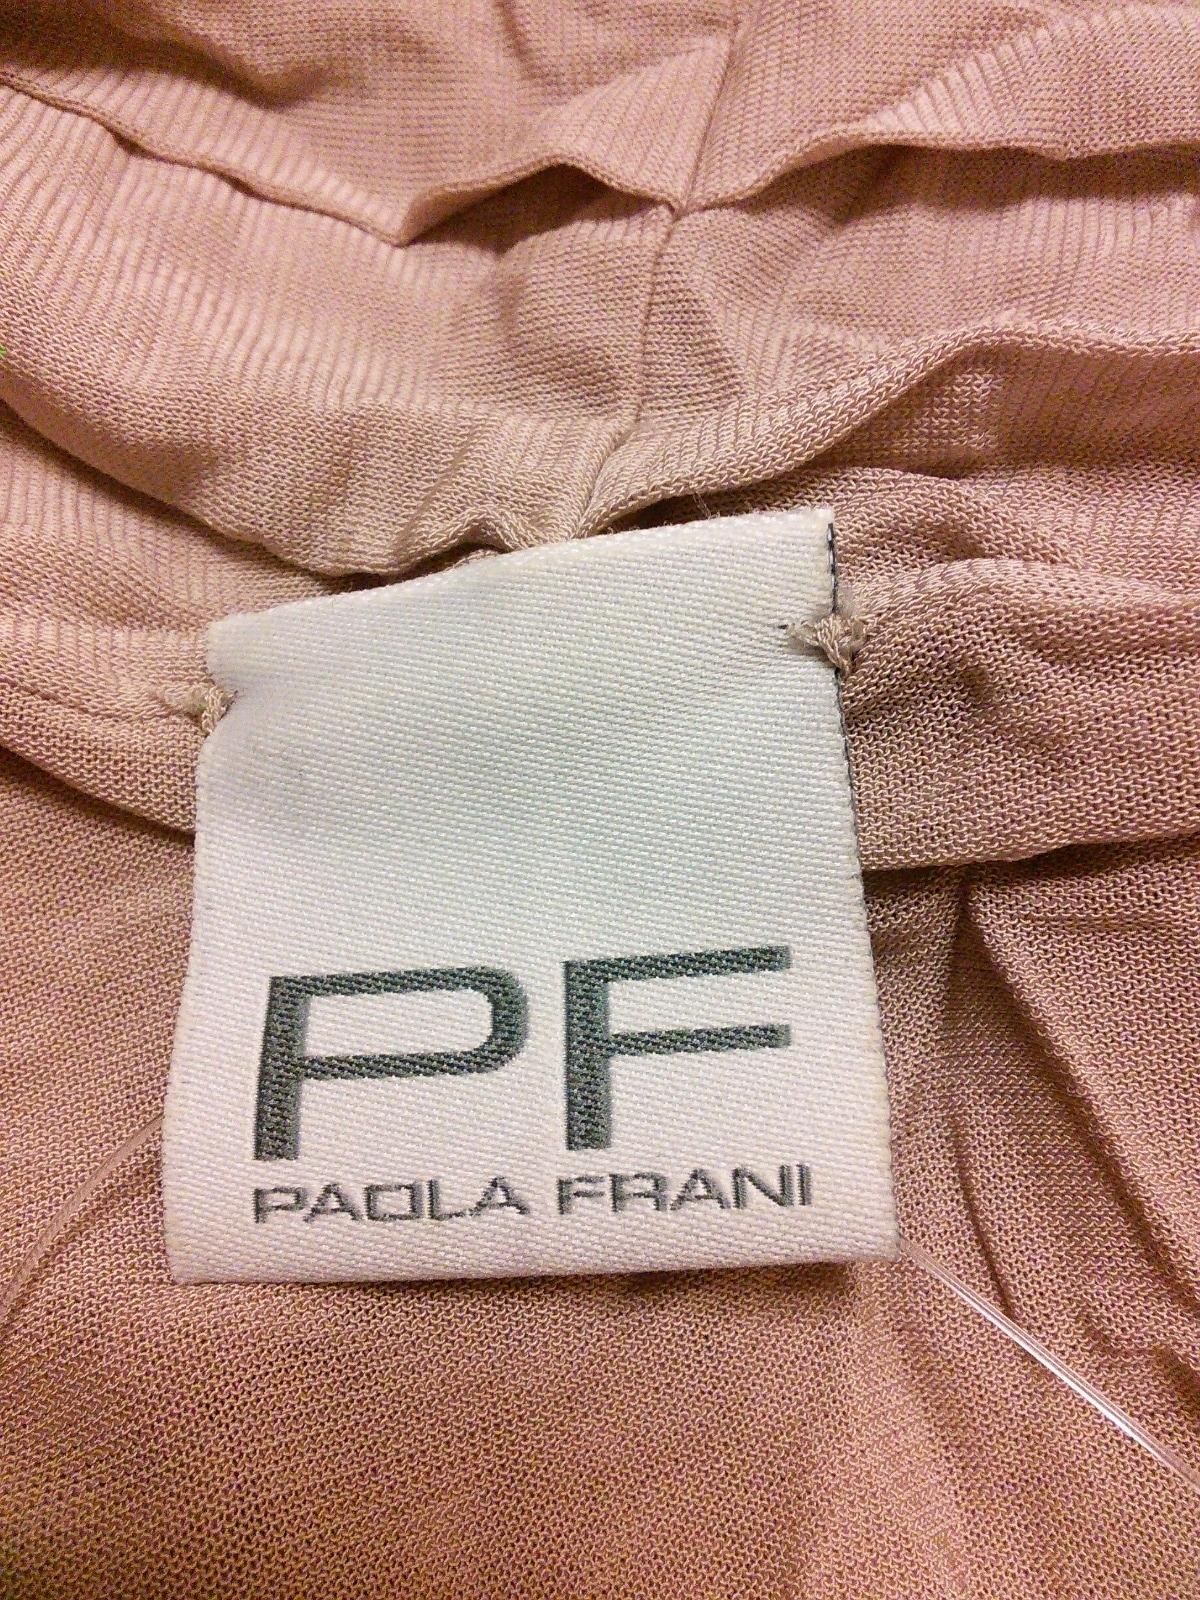 PAOLA FRANI(パオラ フラーニ)のカーディガン